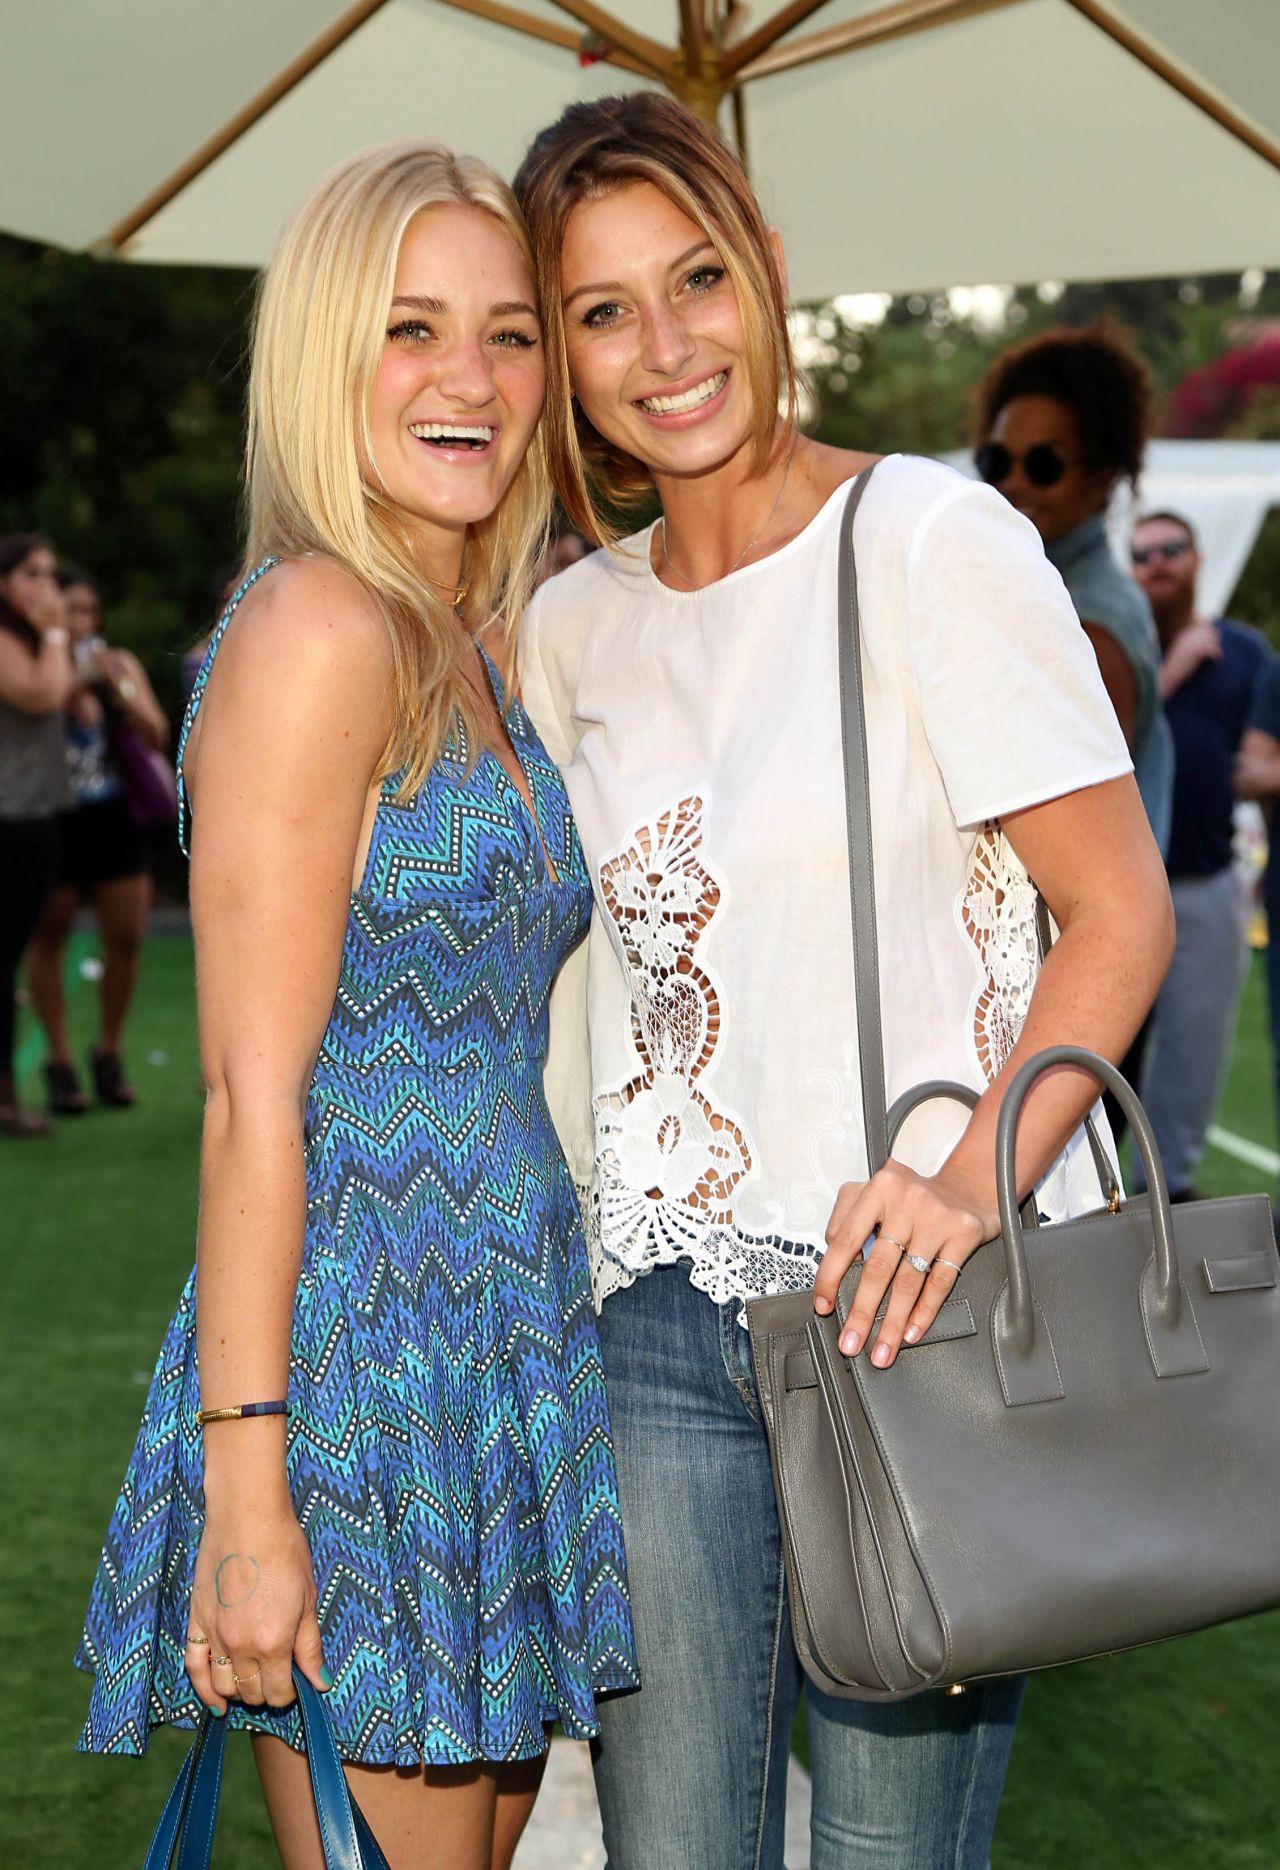 Alyson & Amanda AJ Michalka – 2014 Just Jared Summer Fiesta in West Hollywood